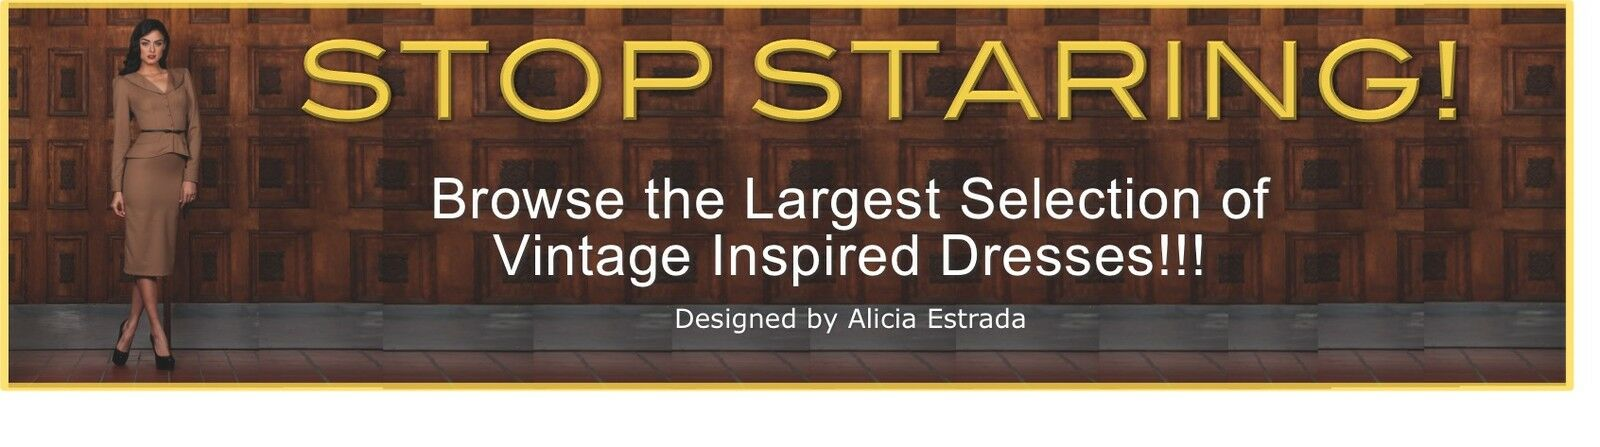 Stop Staring! Designs